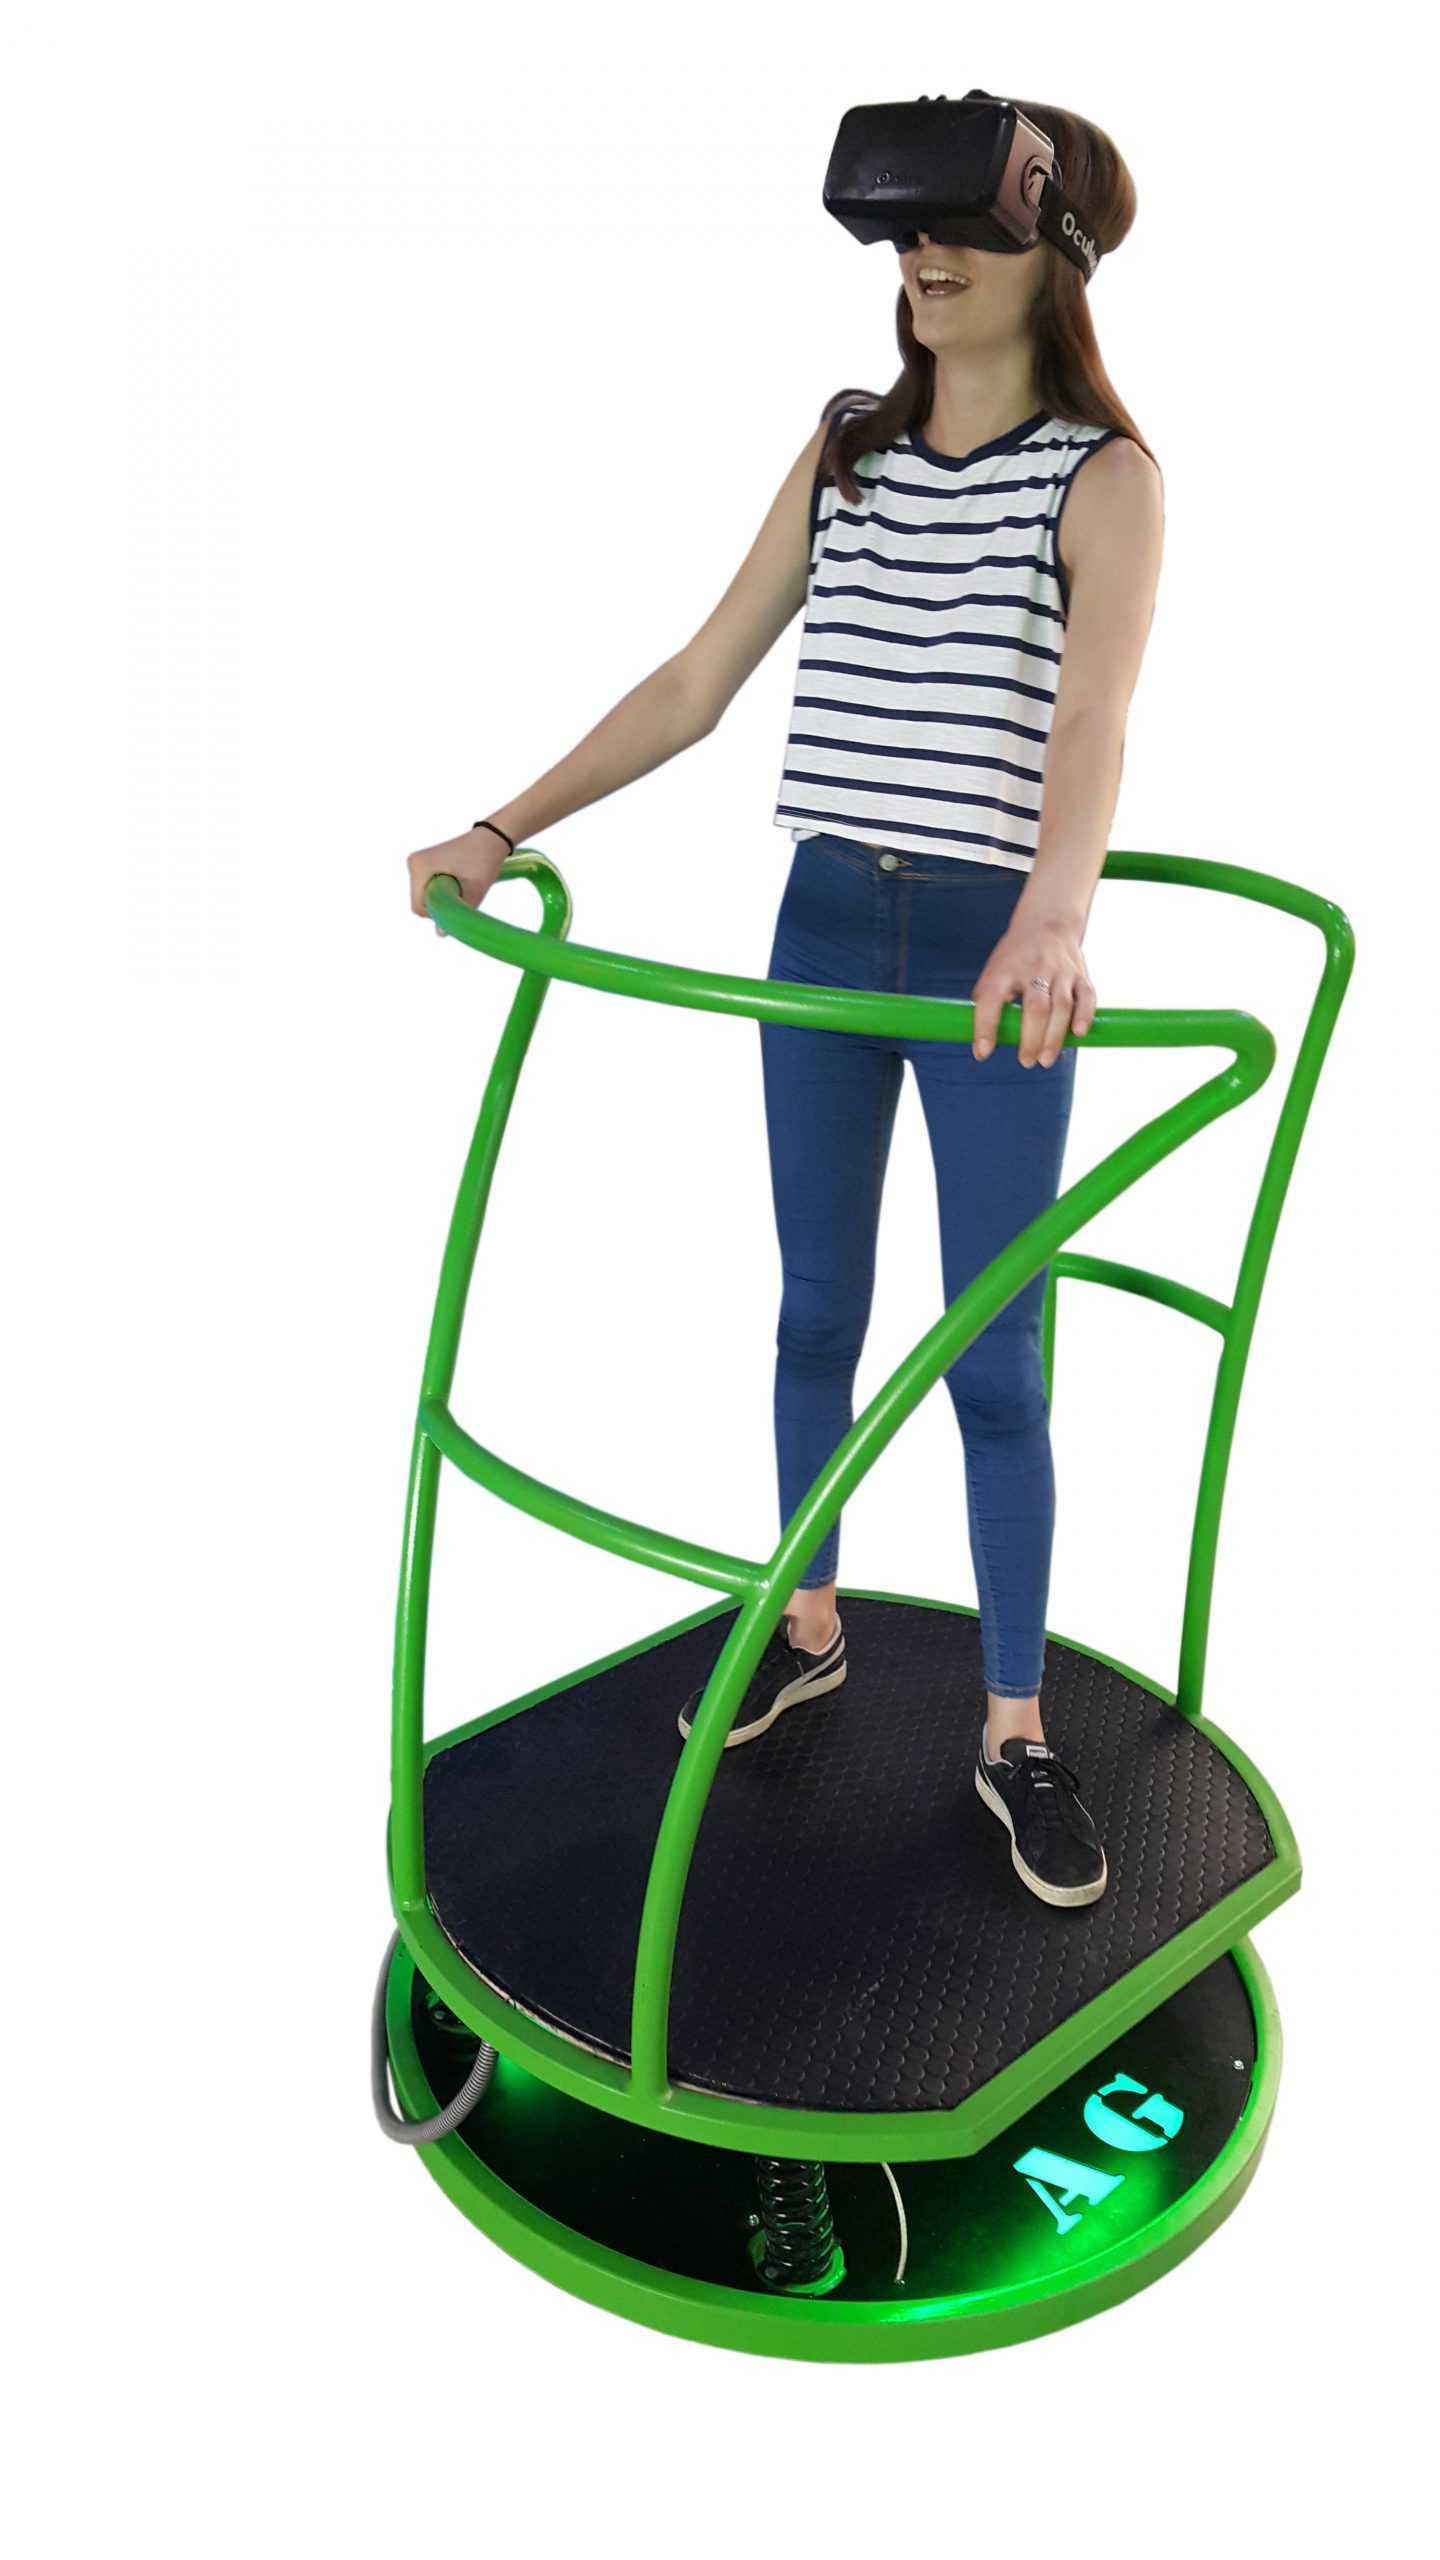 Extreme_SIM_ Full motion VR simulator 2dof, 3dof,4dof,6dof motion platform